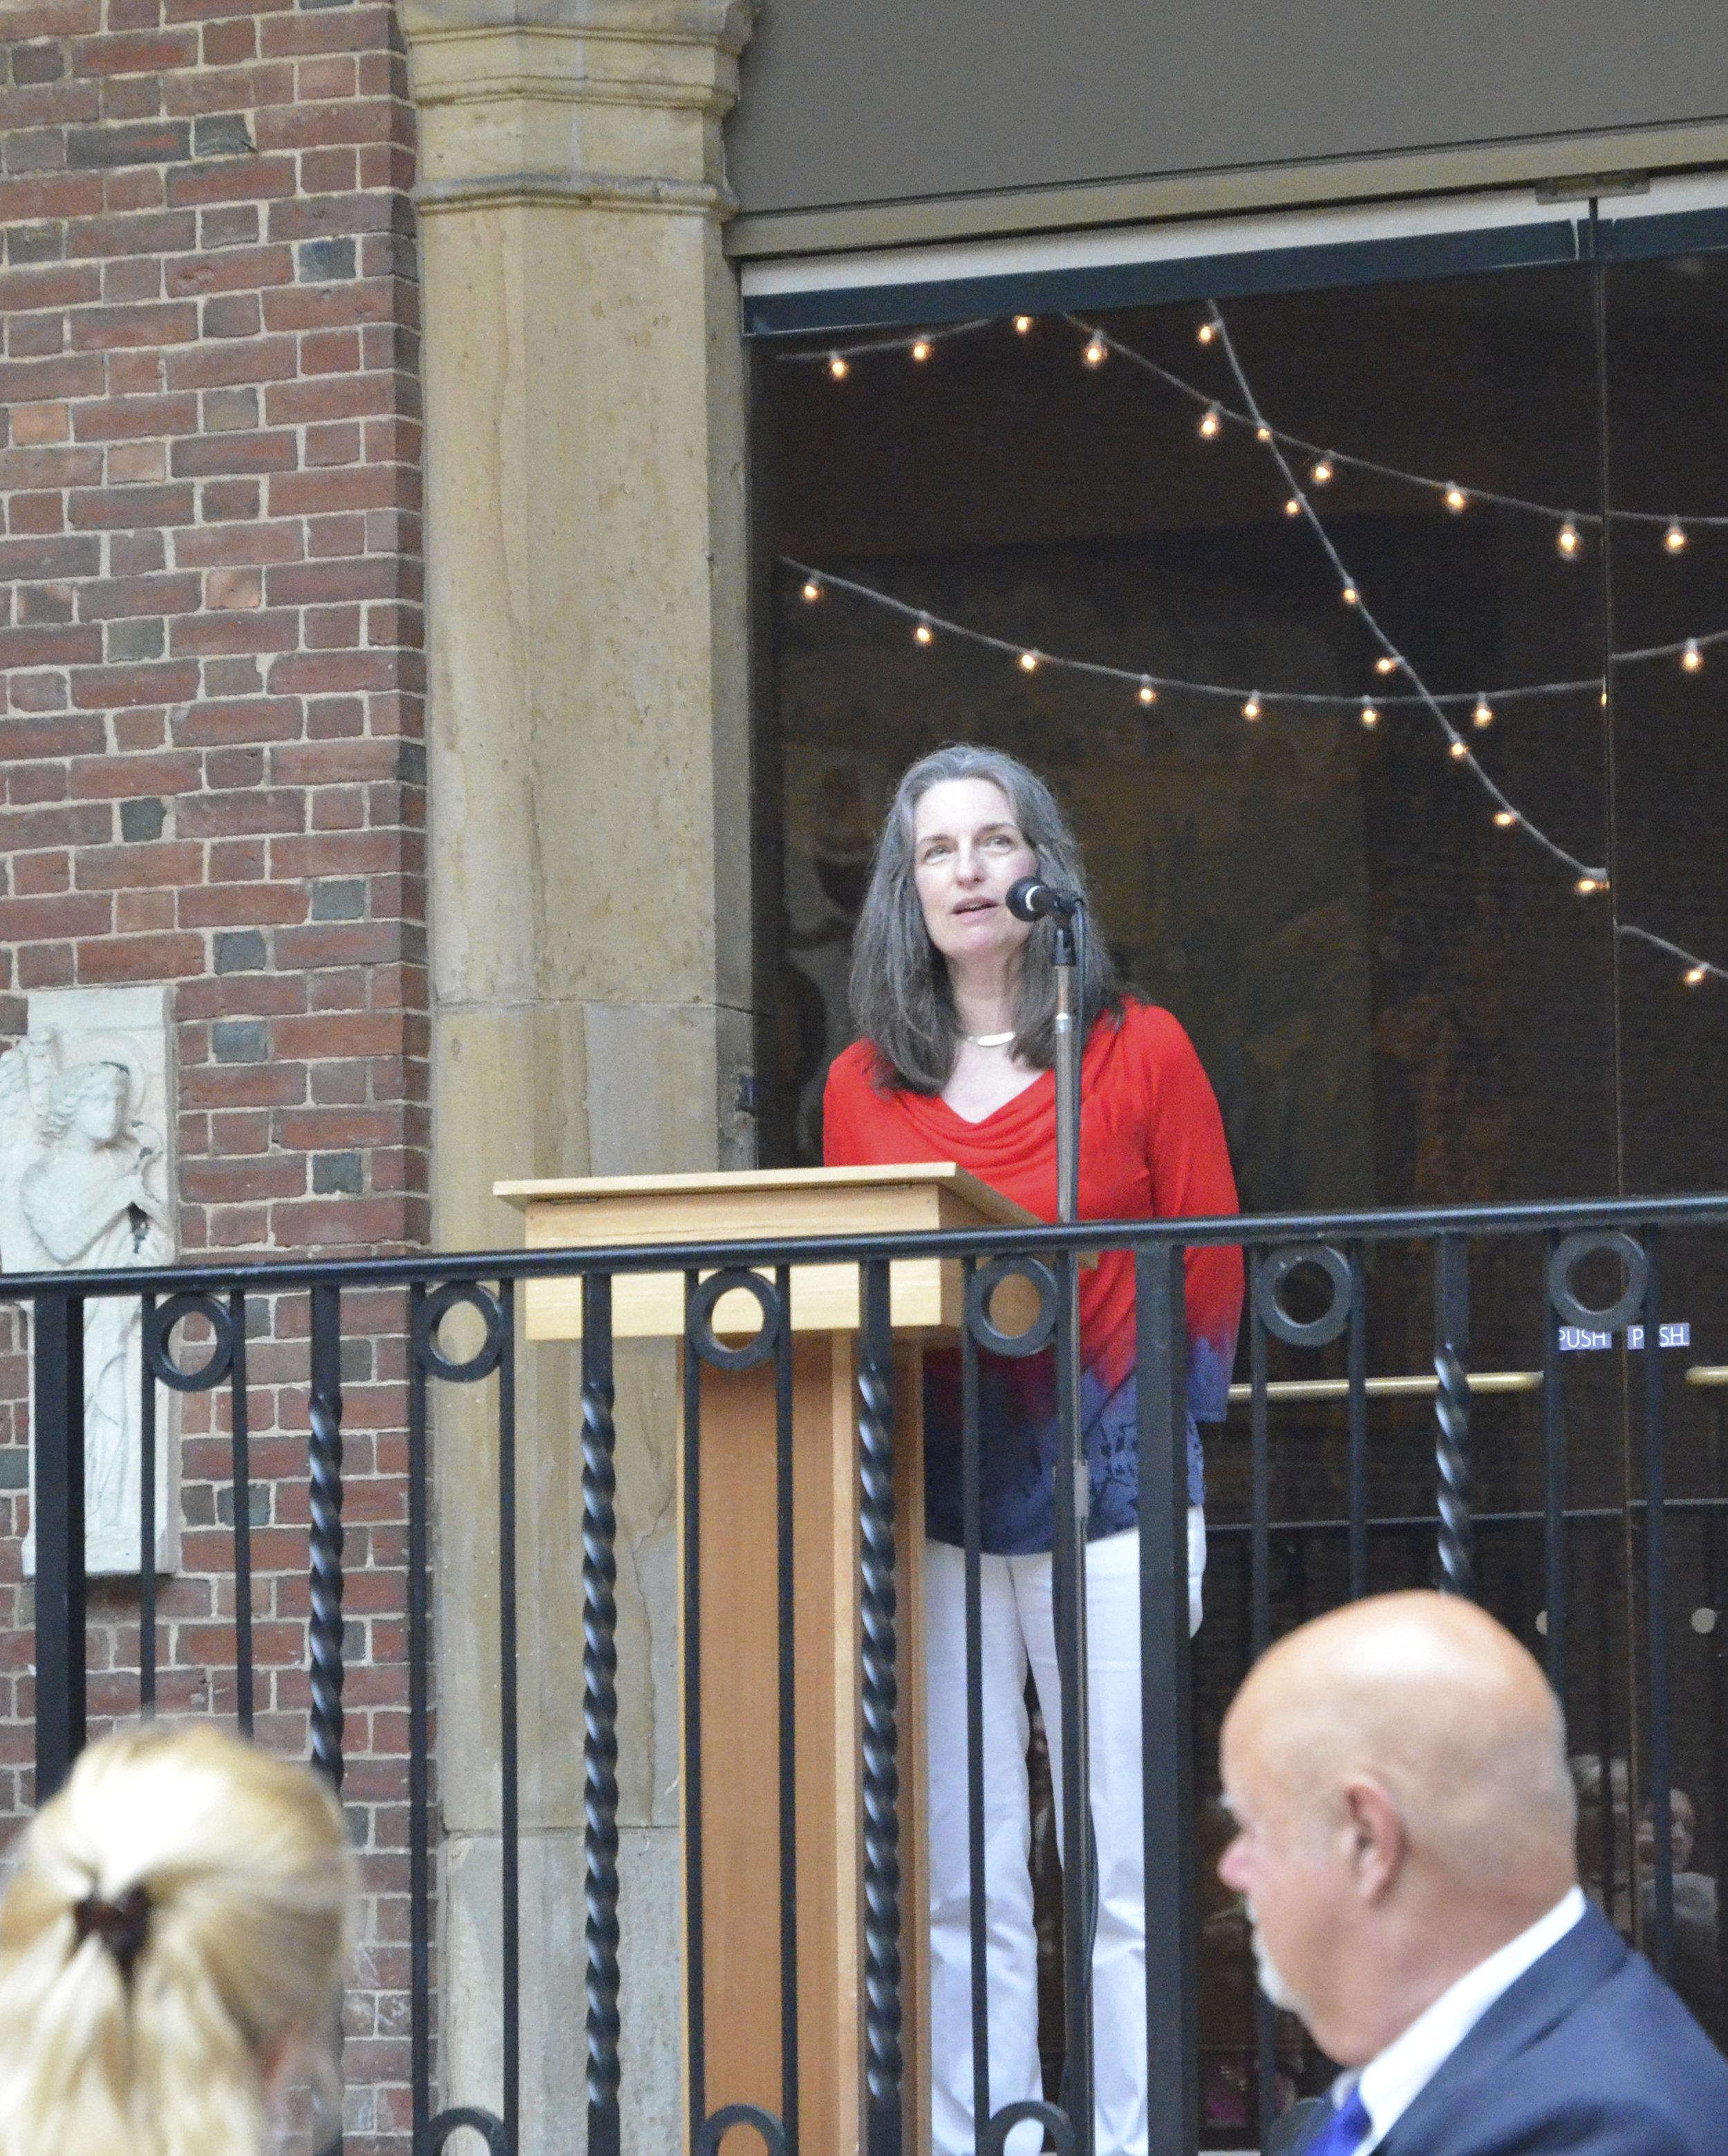 The artist speaking at the Dayton Art Institute